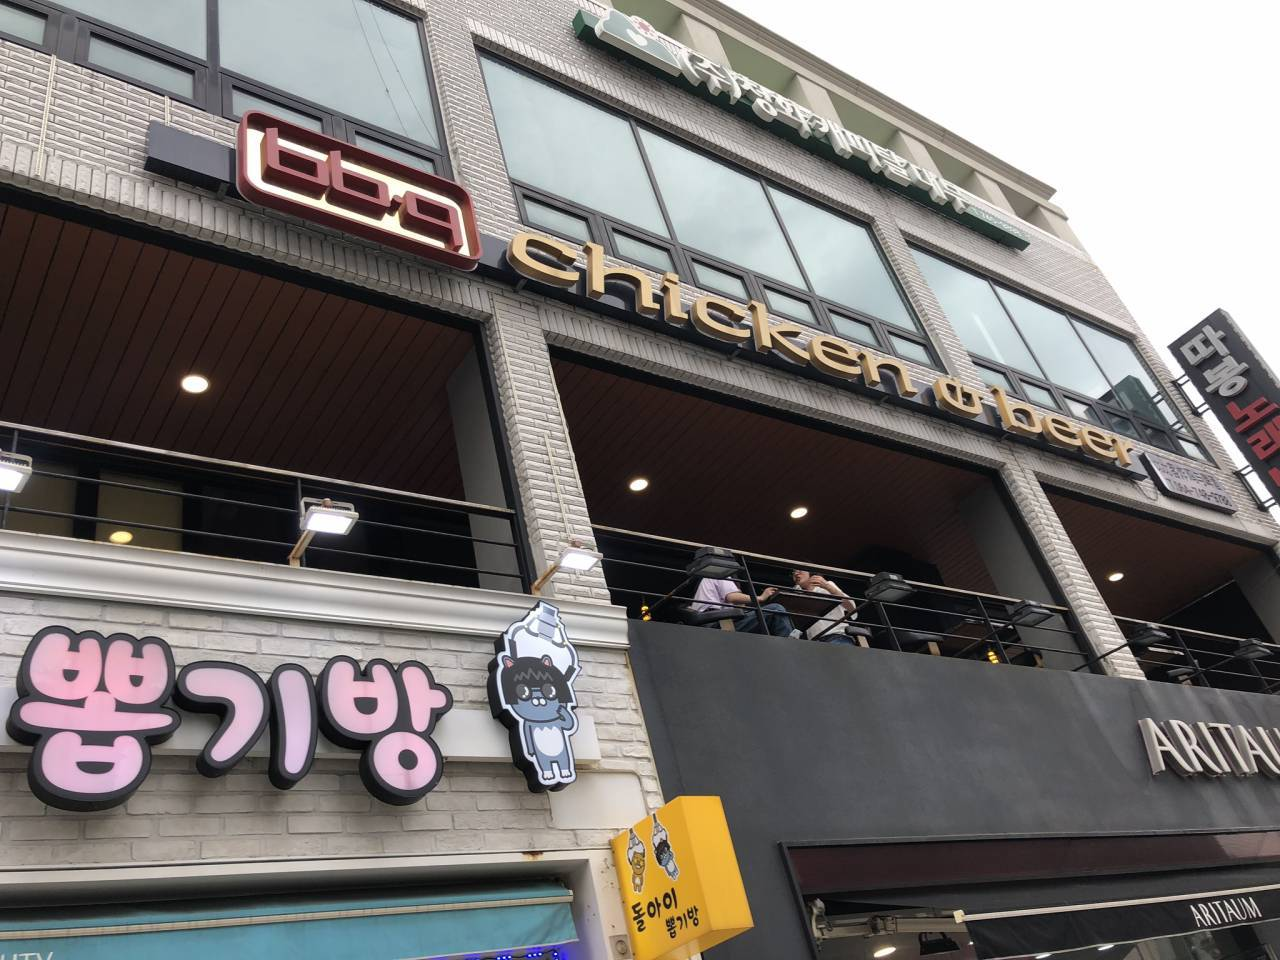 BBQ Chicken Jeju Sammu Gongwon(BBQ OLIVE CHICKEN & BEER 제주삼무공원)